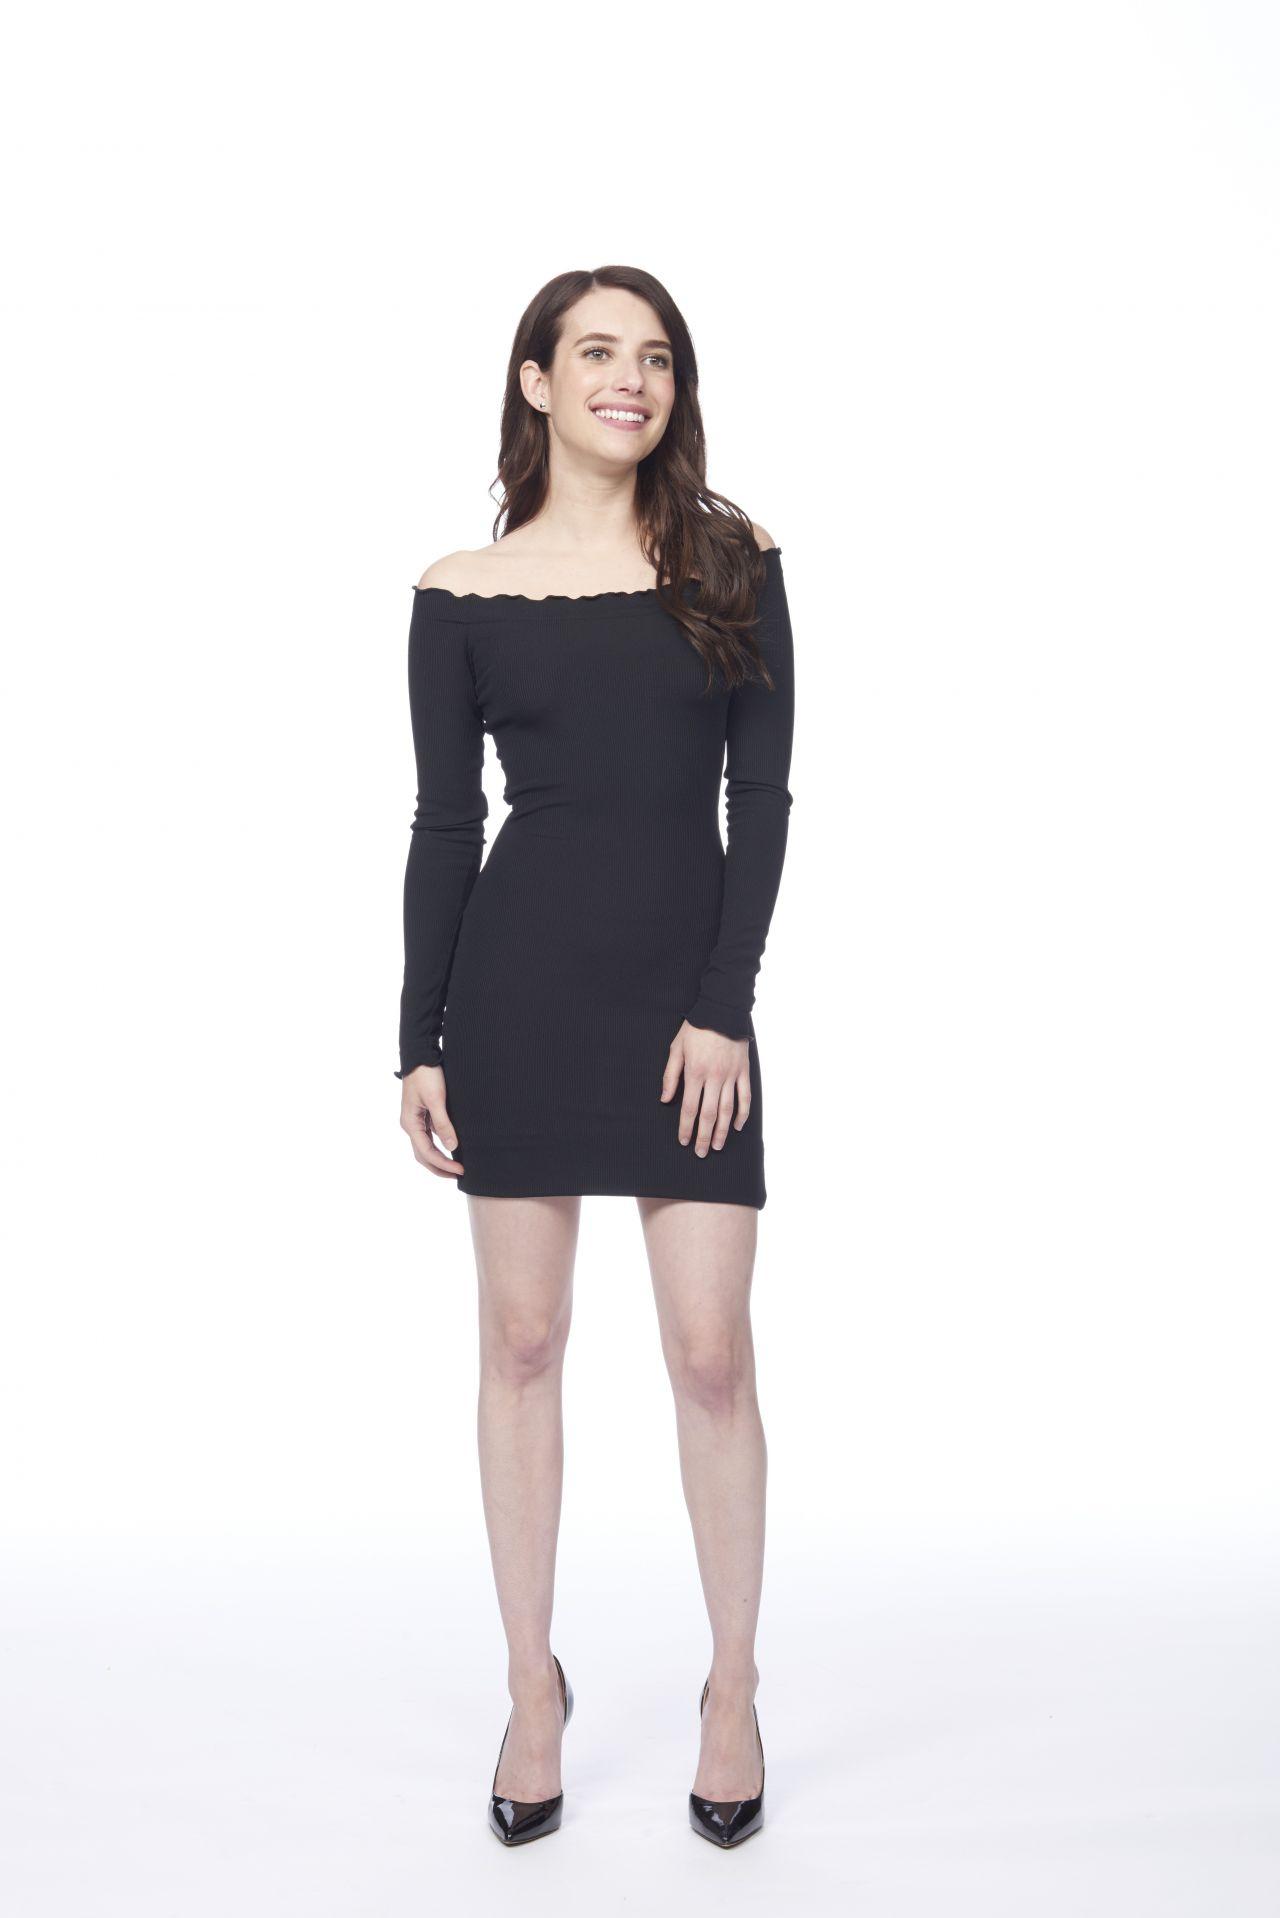 https://celebmafia.com/wp-content/uploads/2018/10/emma-roberts-little-italy-promoshoot-11.jpg